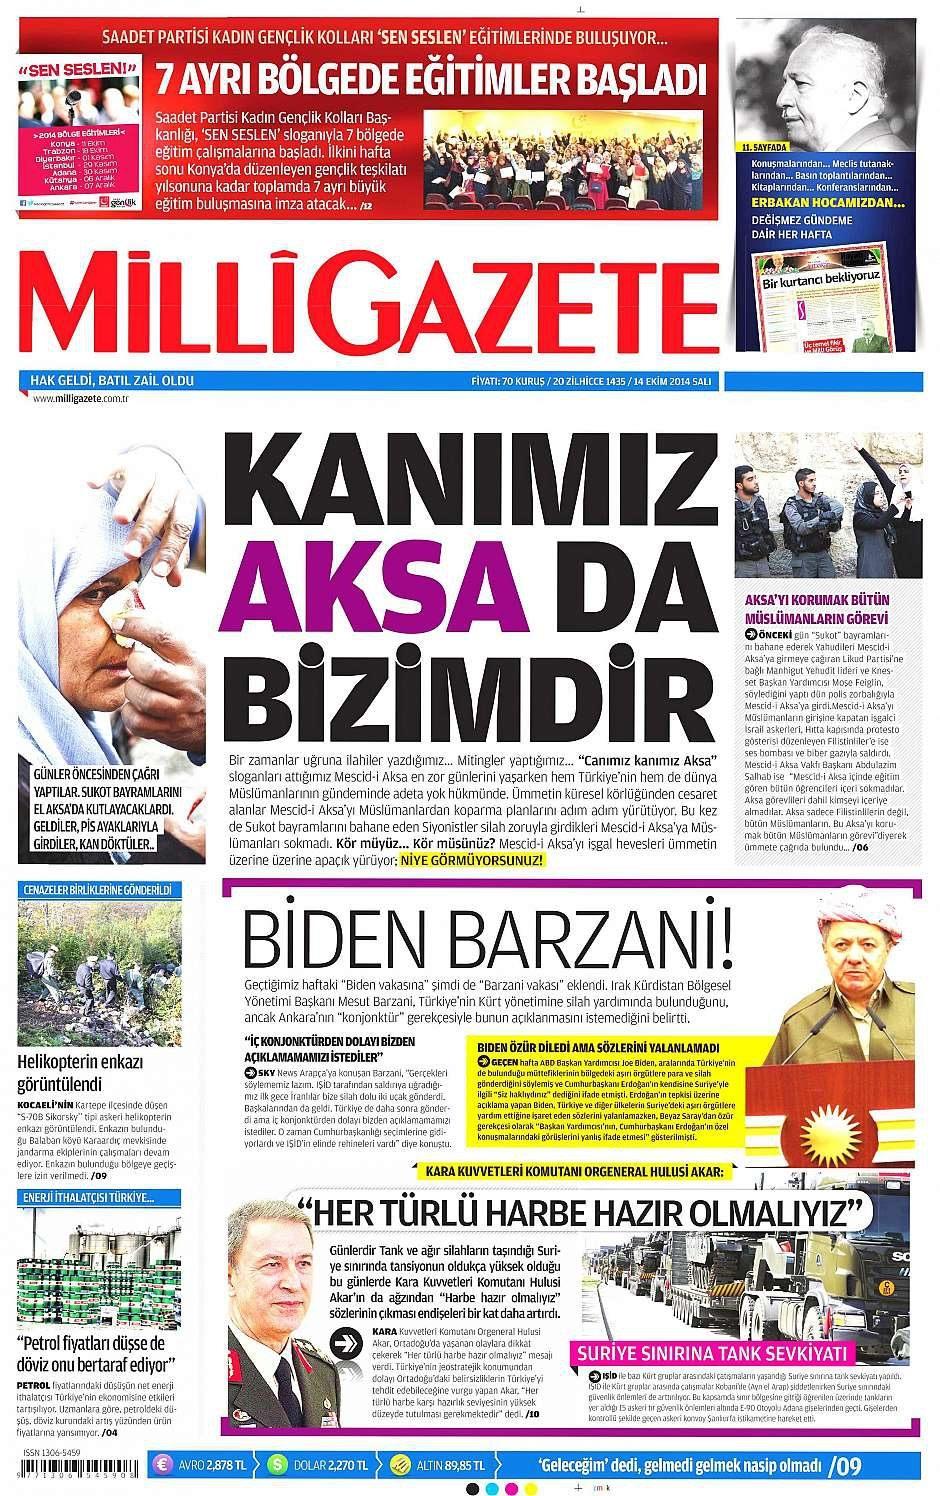 14 Ekim 2014 gazete manşetleri 15